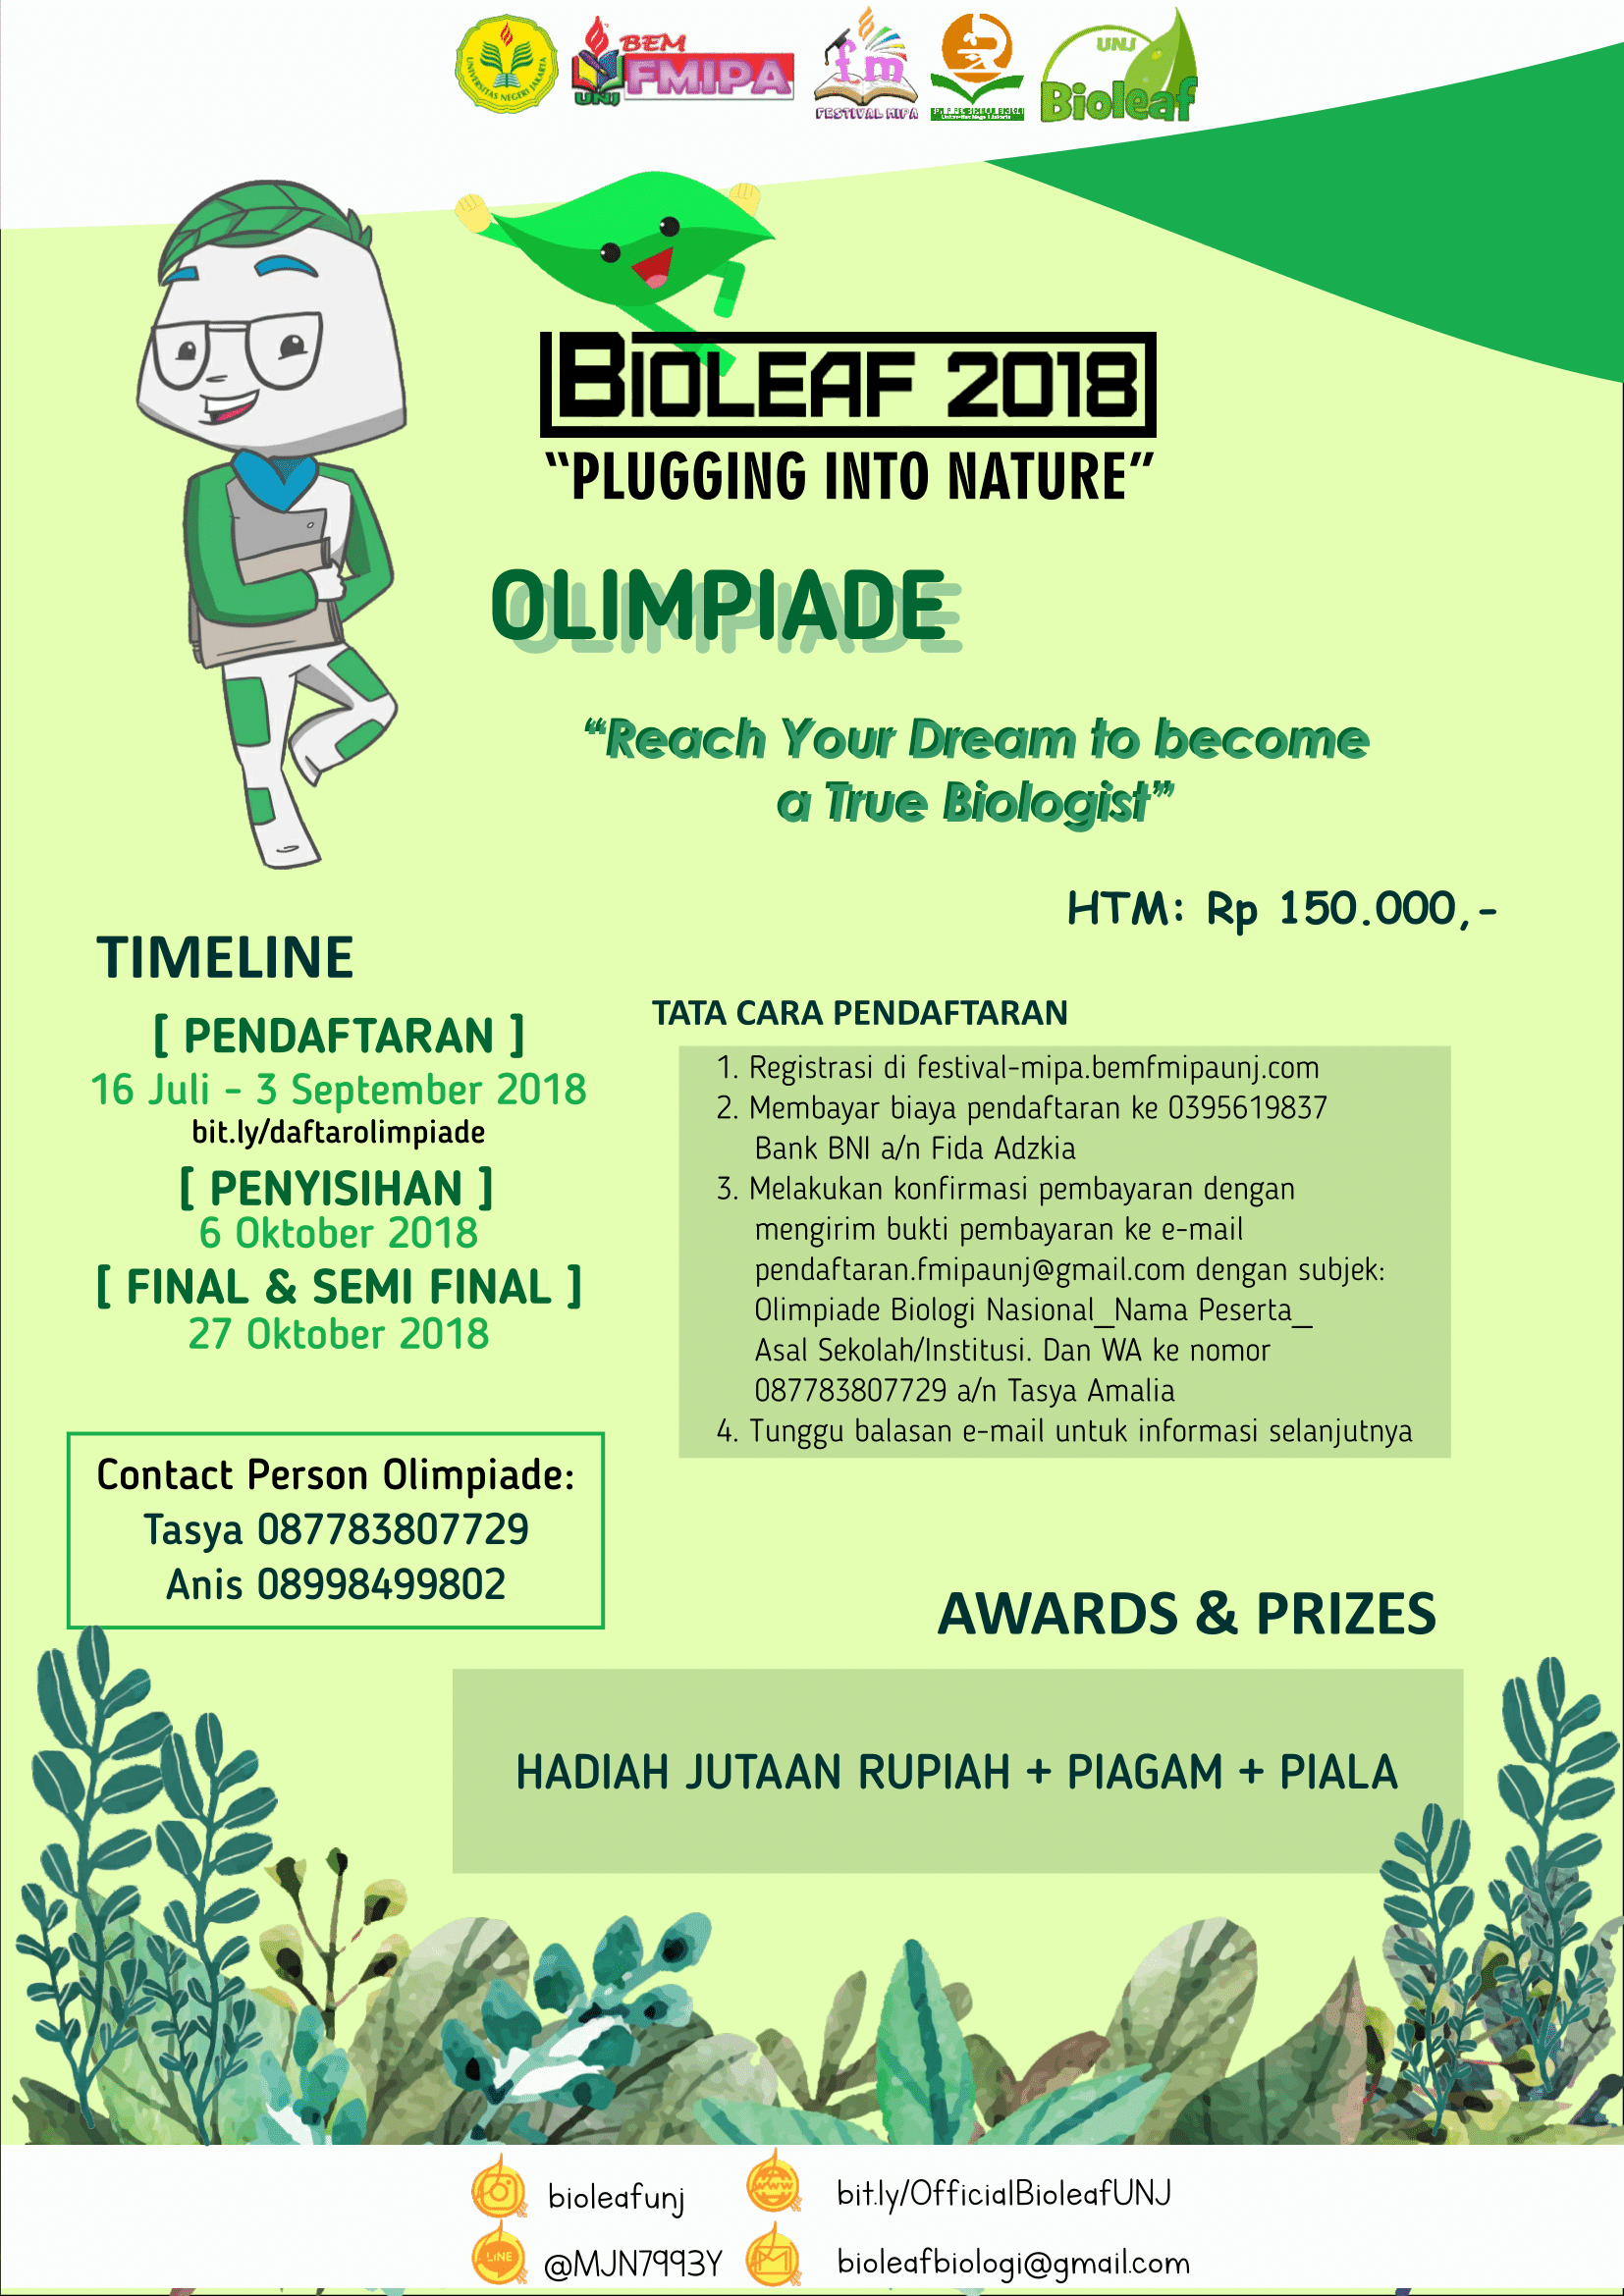 olimpiade-biologi-nasional-2018